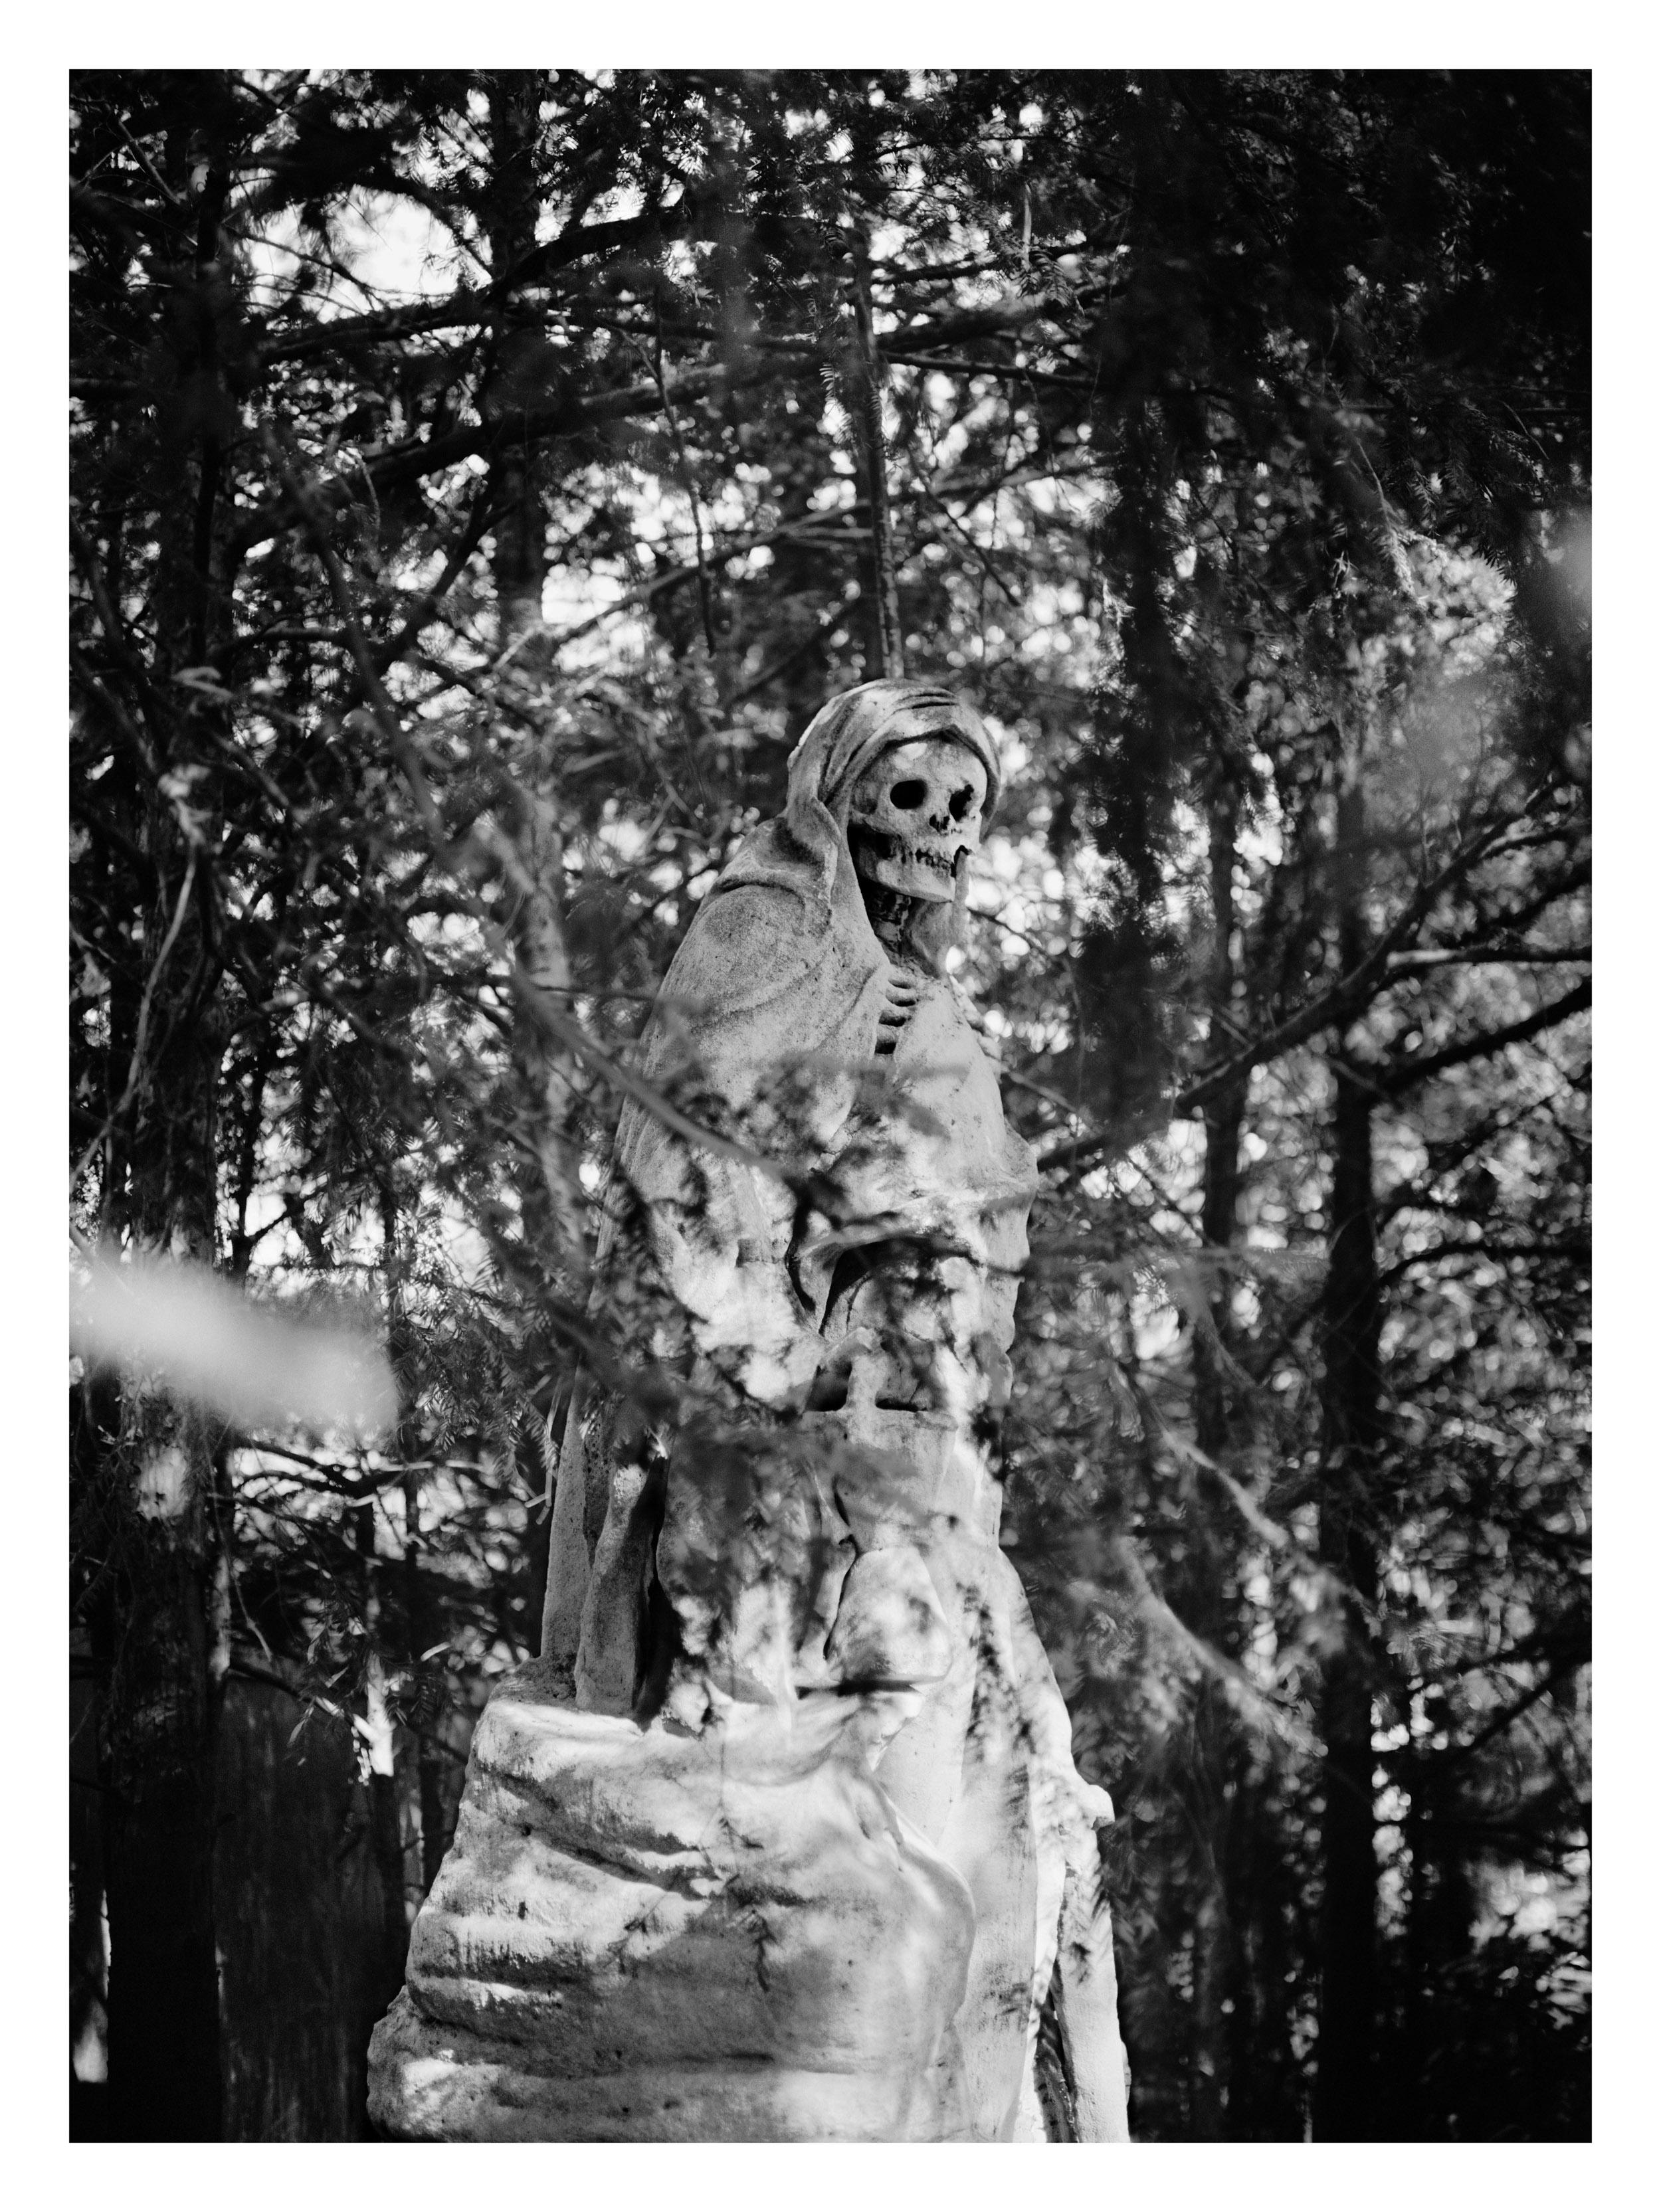 Margarete Jakschik  Untitled  2011 C-print 21h x 15w in Edition of 5 MJ012